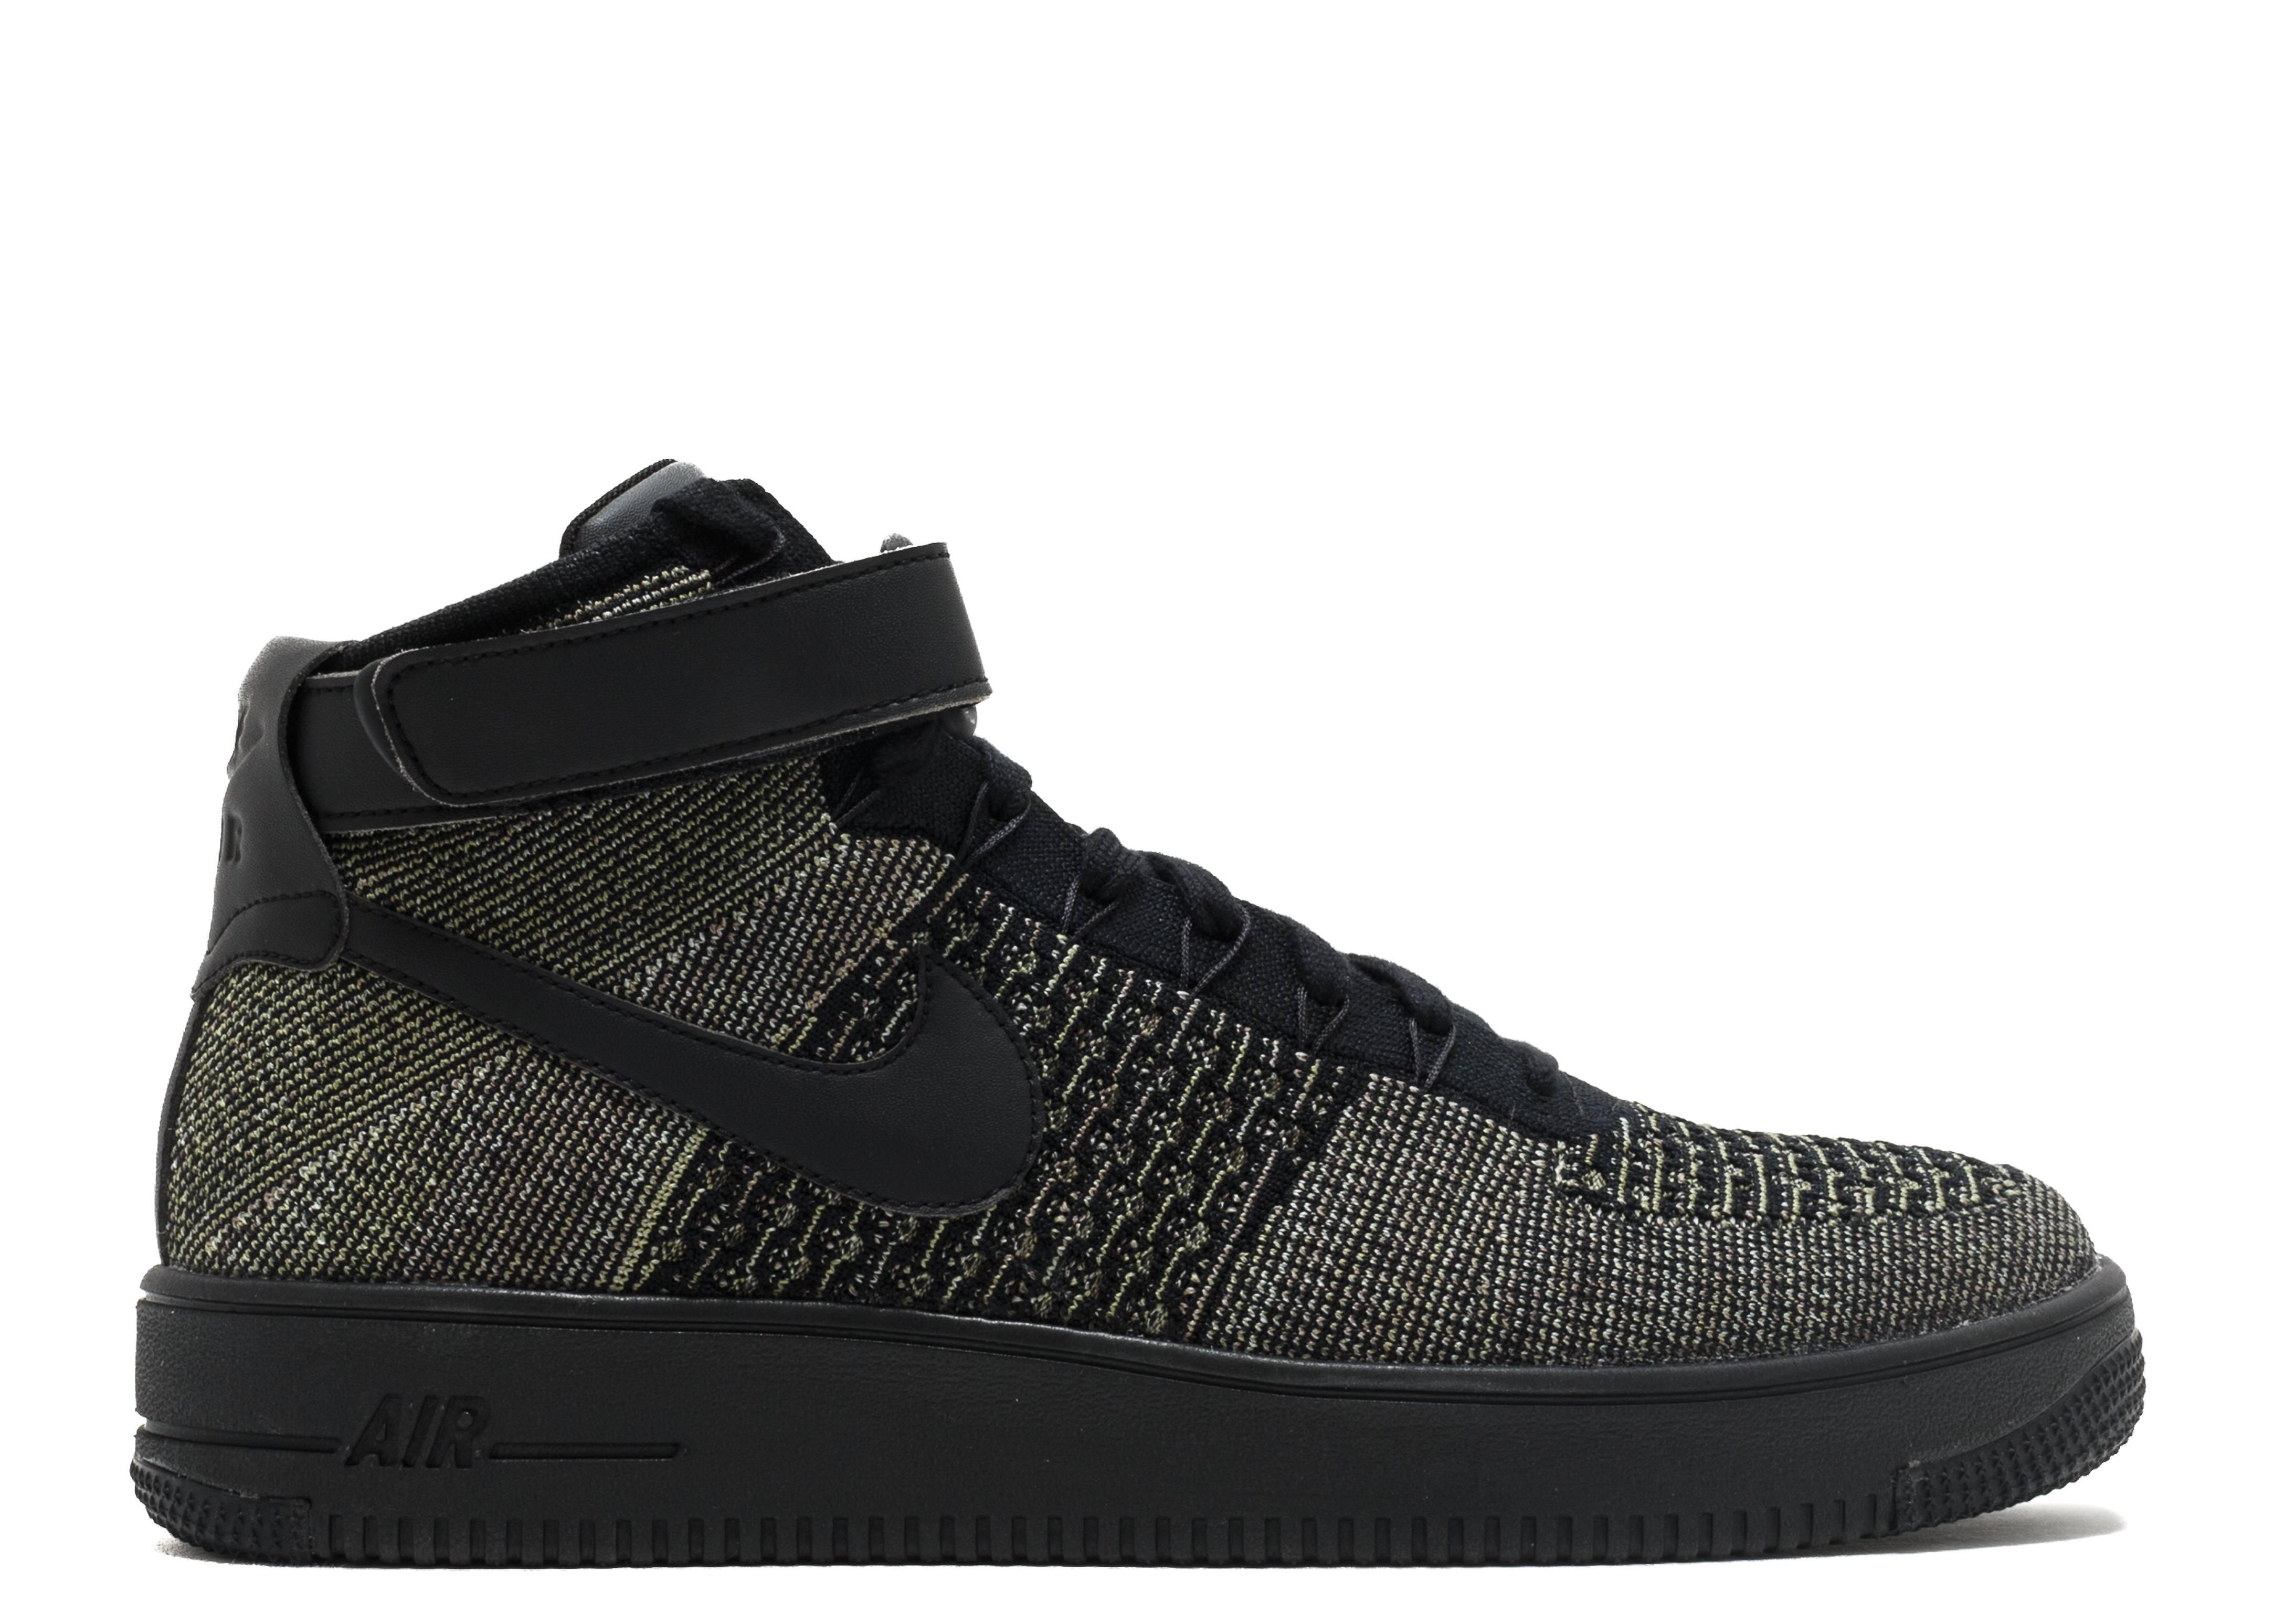 Cheap Nike Sportswear Air Force 1 Ultra Flyknit Mid Palm Green Basketball Shoes for Men Online Sale